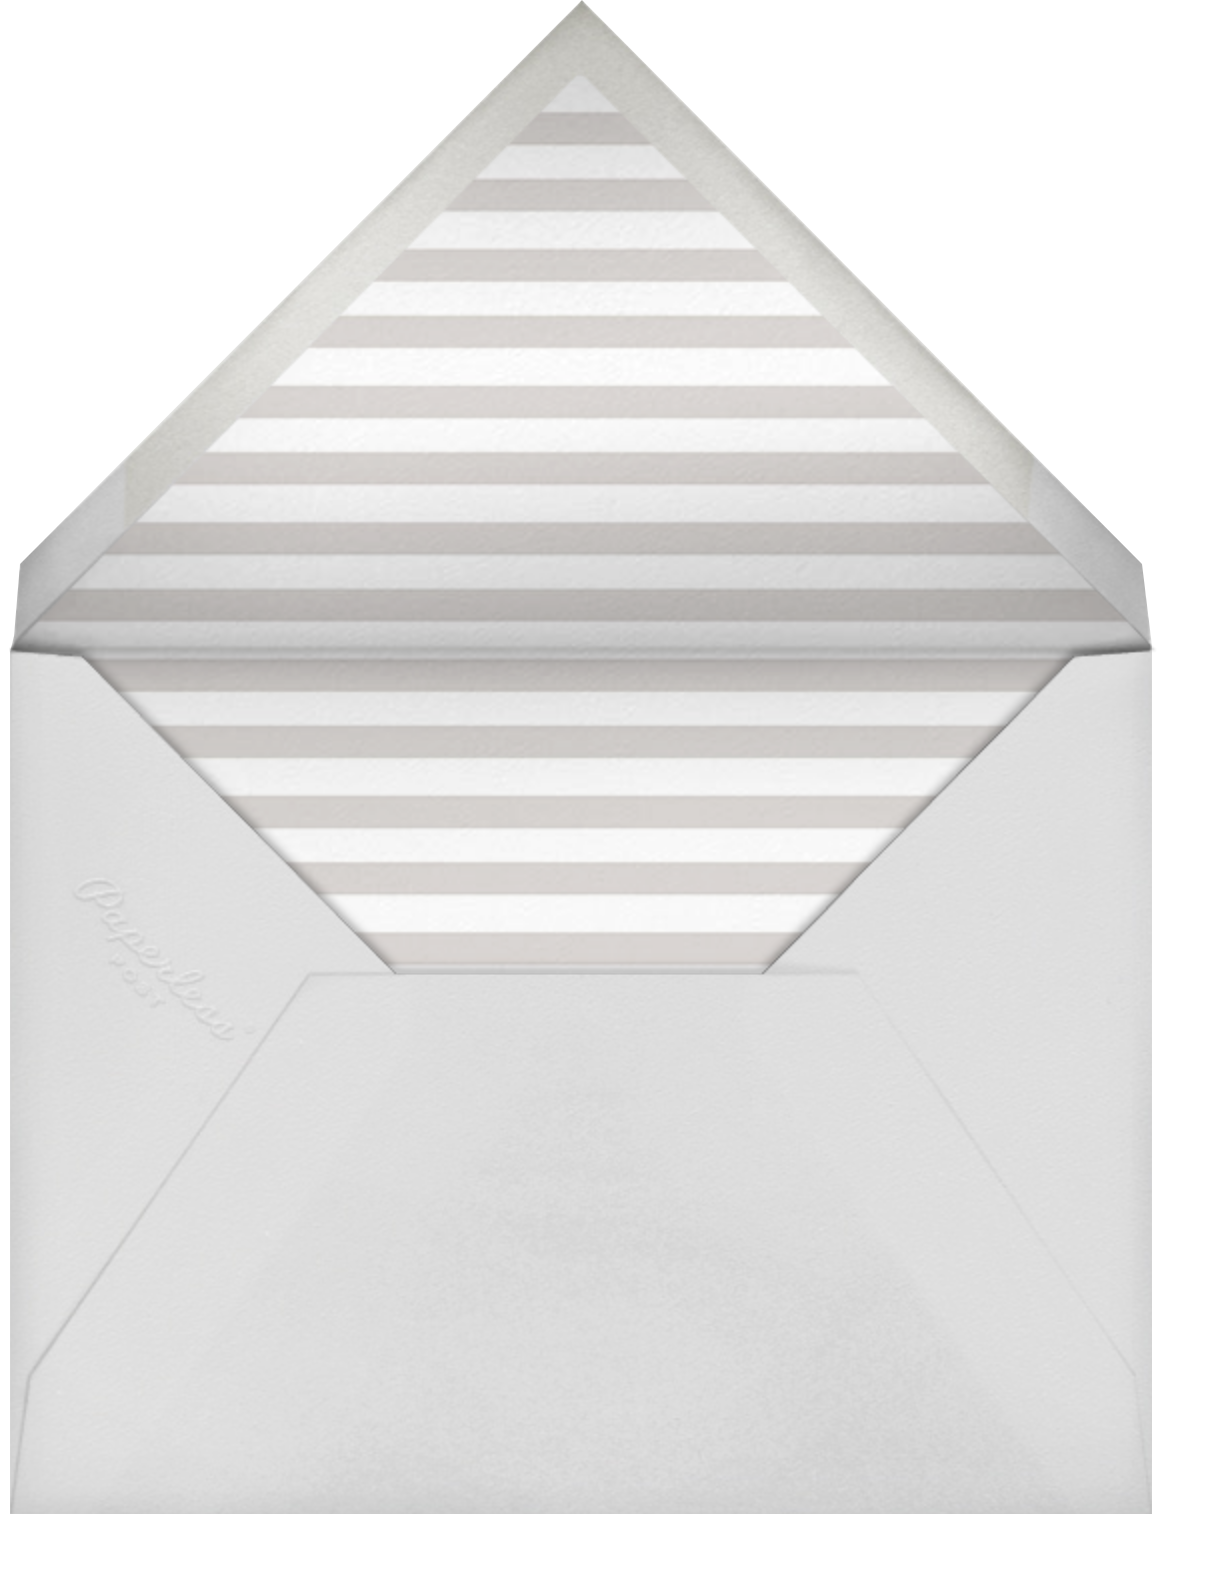 Square Frame (Horizontal) - Gray - Paperless Post - Baptism  - envelope back